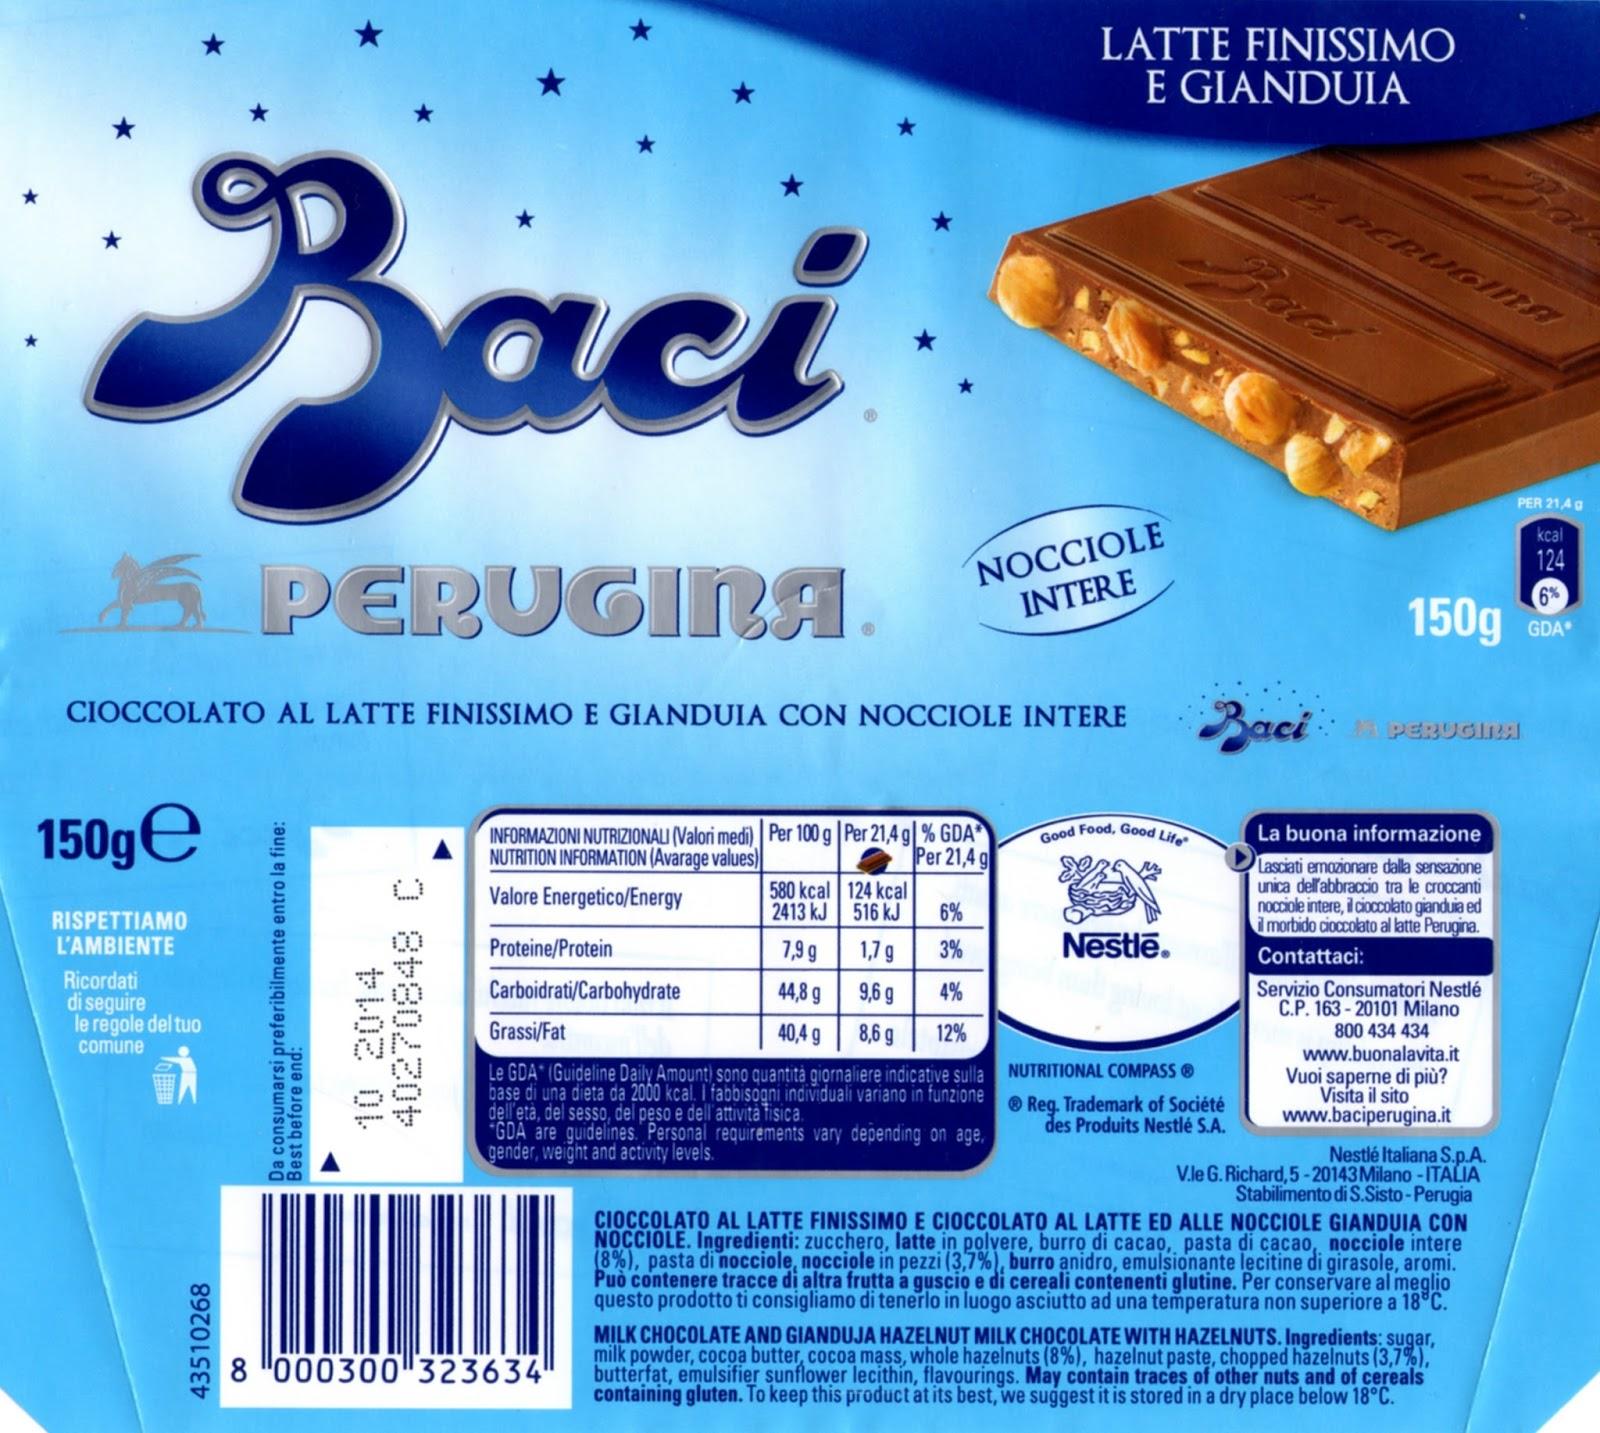 tablette de chocolat lait gourmand nestlé baci latte finissimo e gianduja